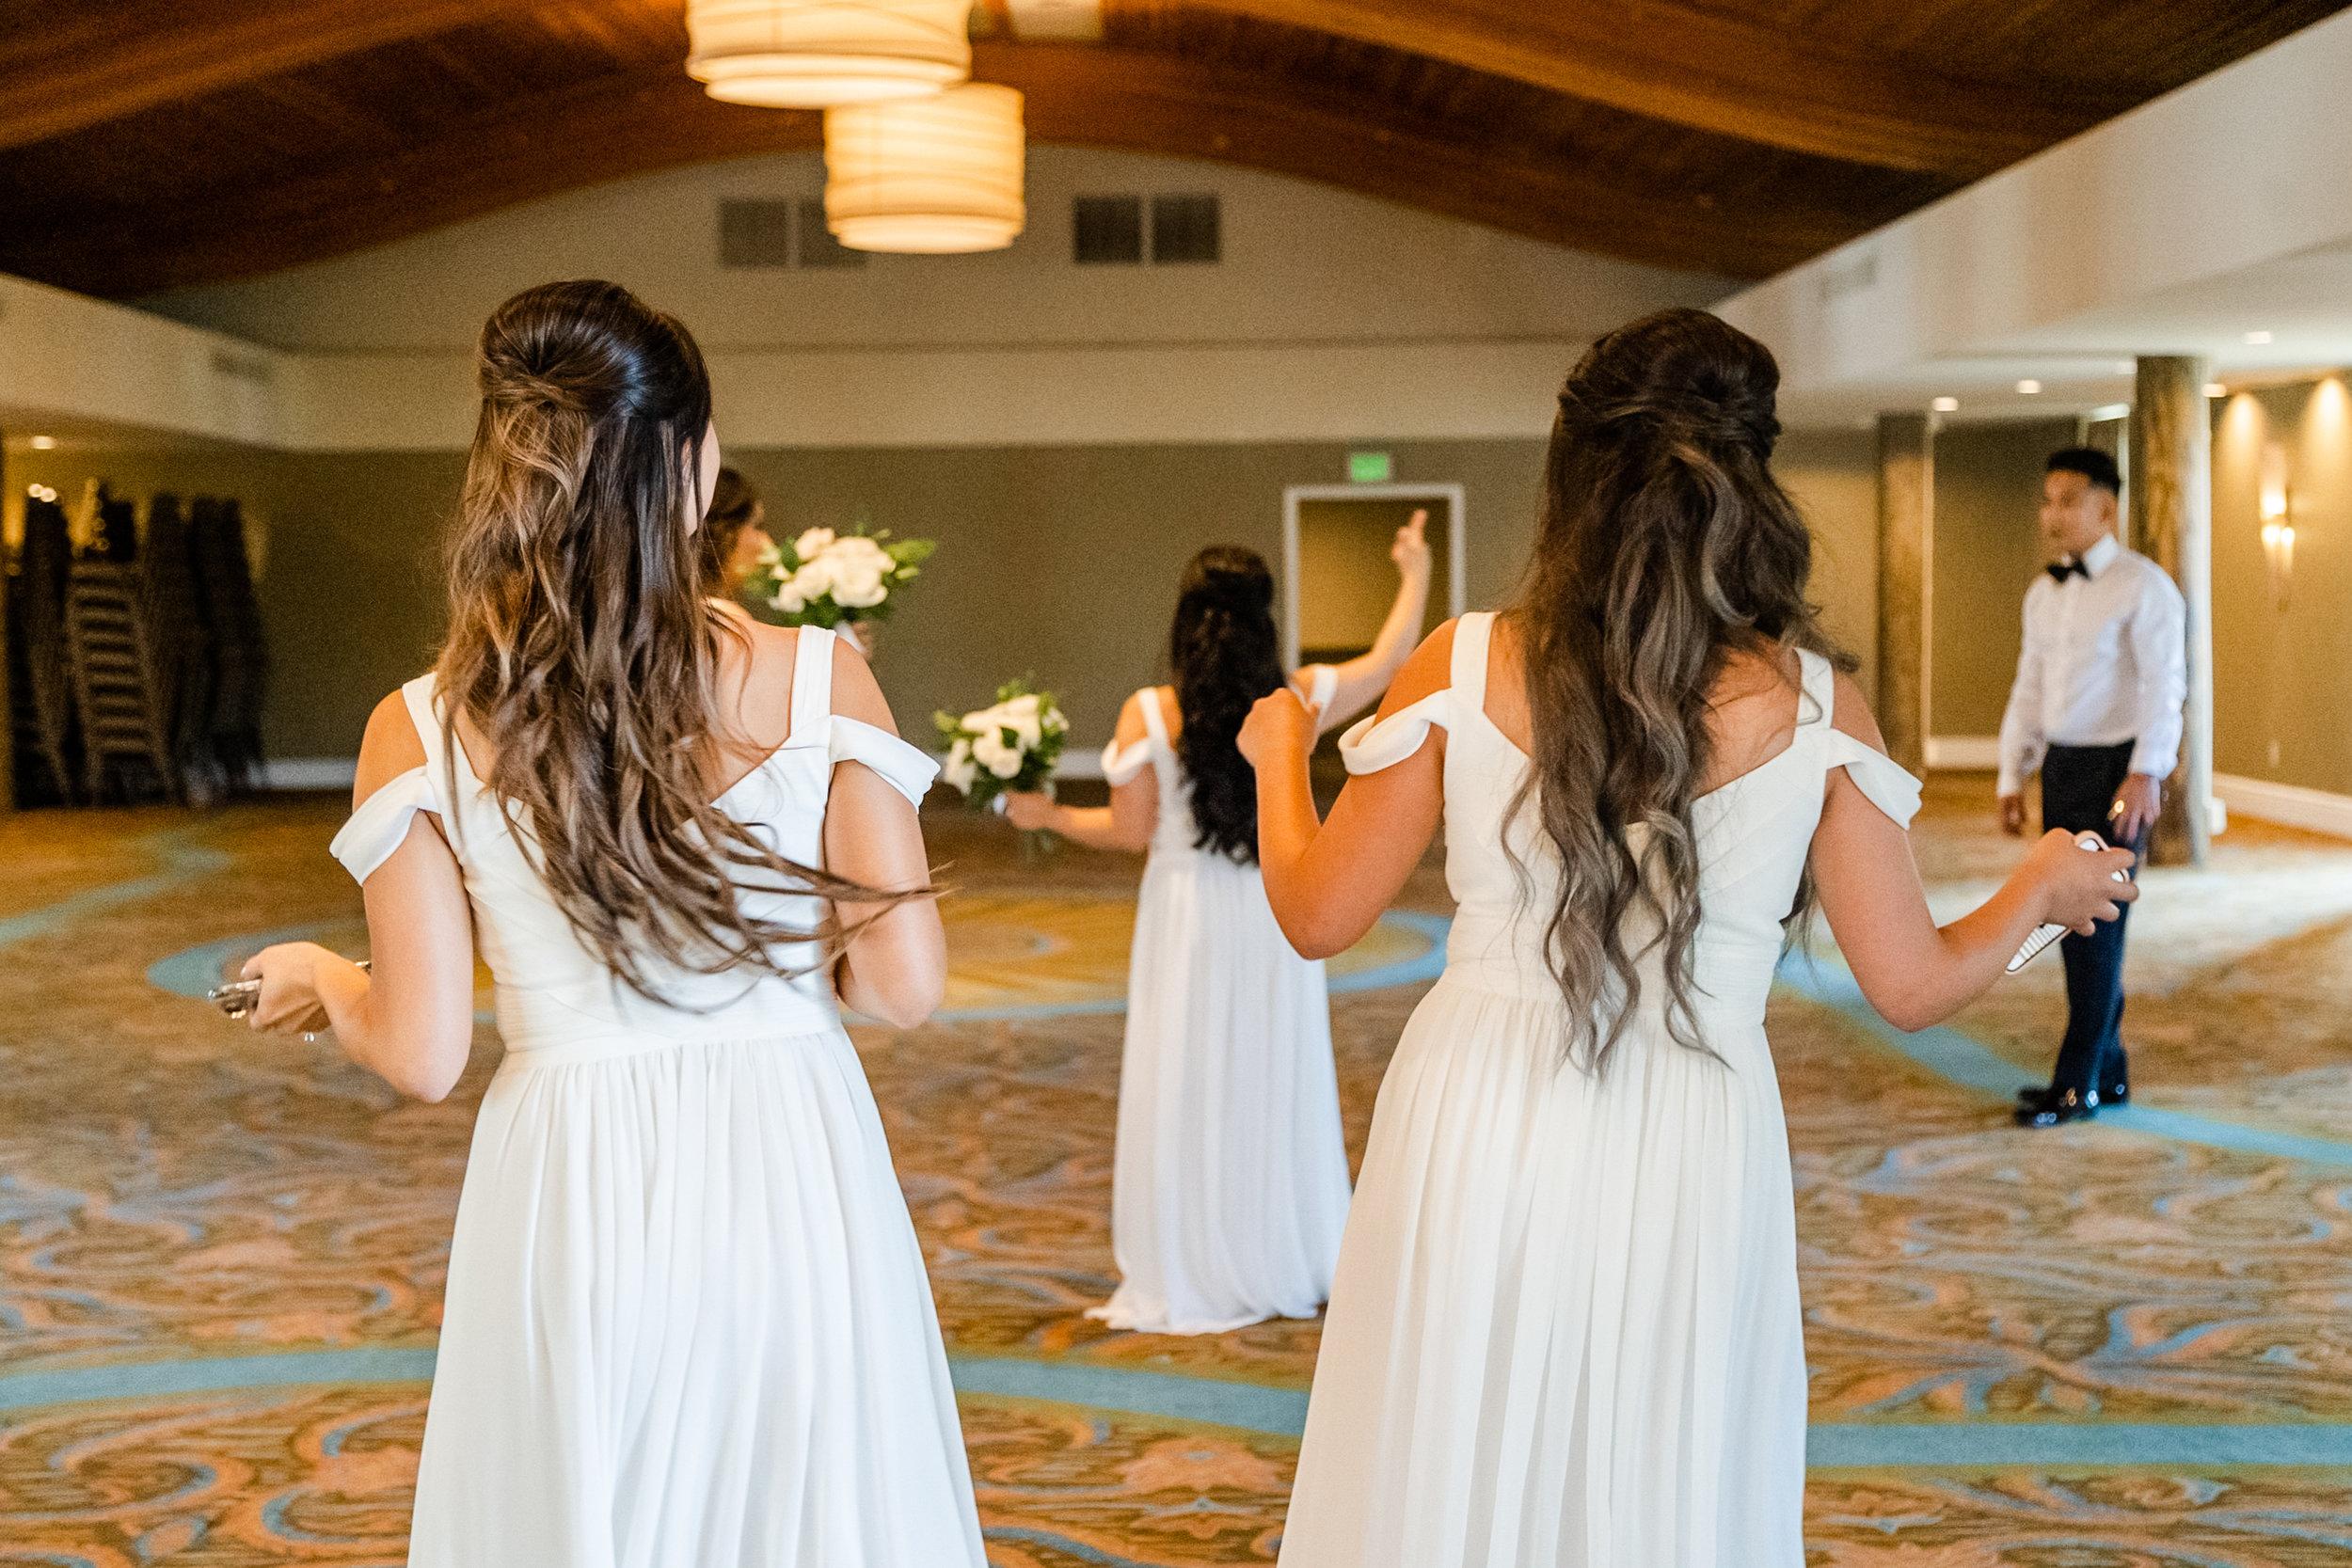 rebeccaylasotras-sandiego-lgbt-wedding-photography-21.jpg